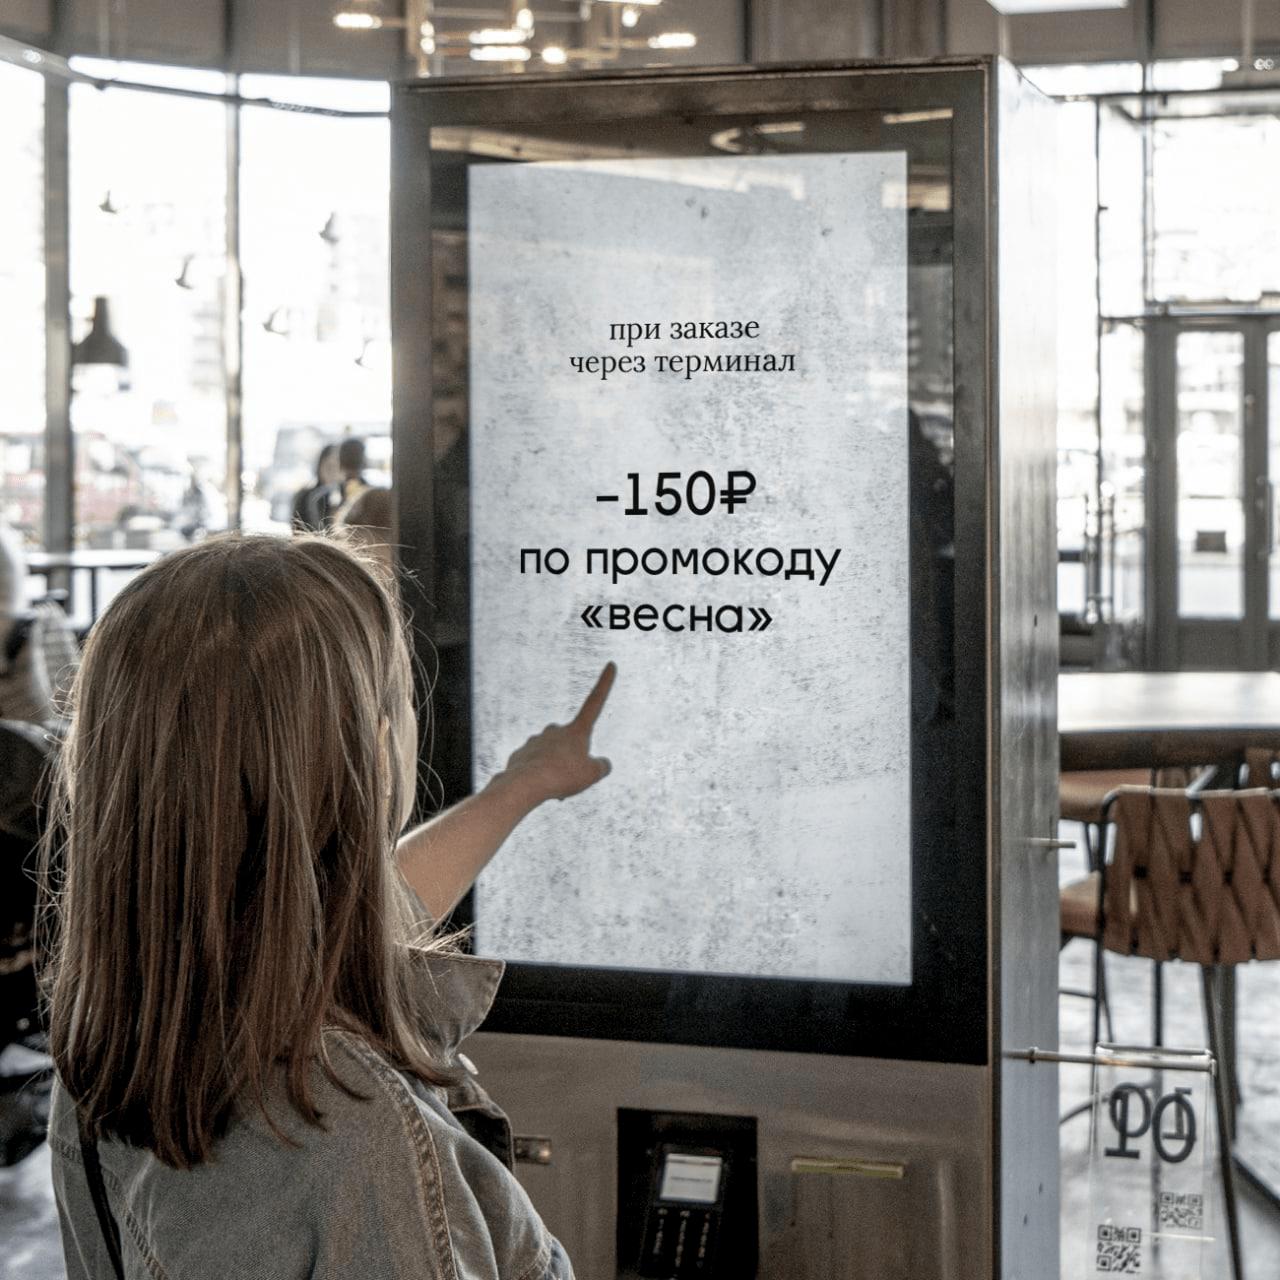 Дарим -150 рублей по промокоду «ВЕСНА»